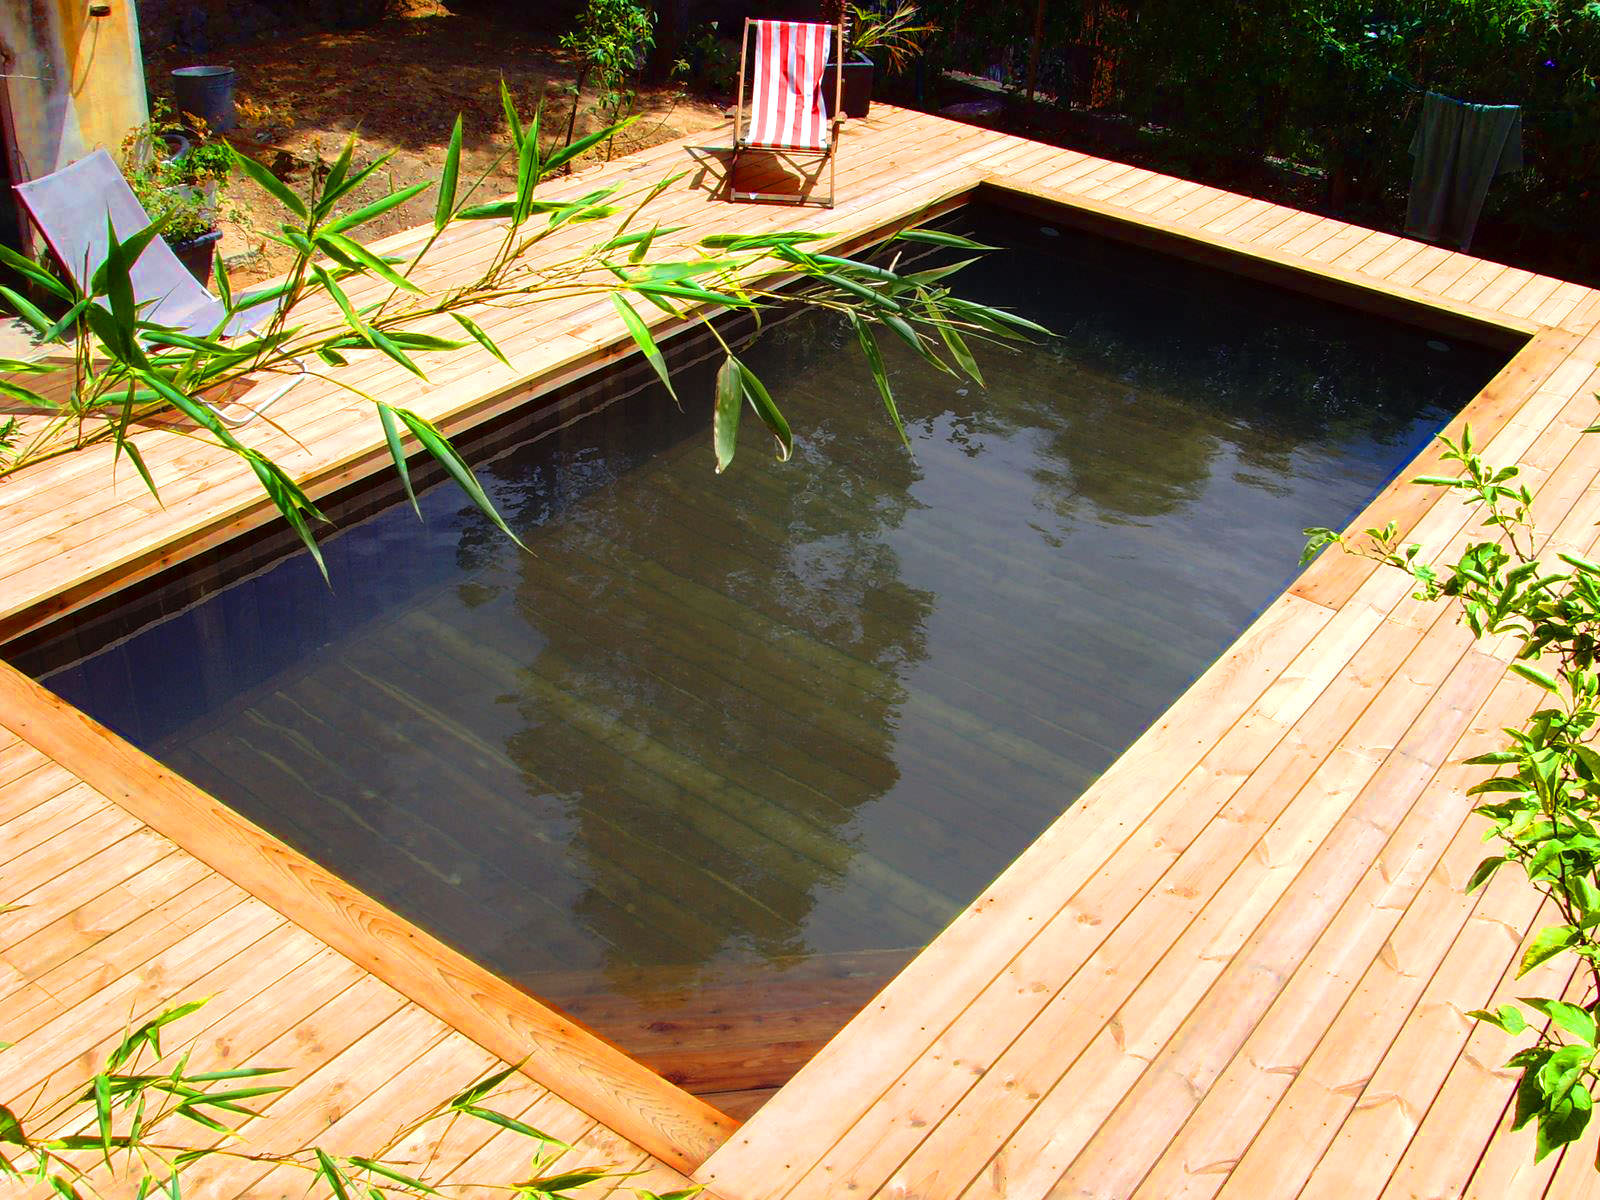 Piscine semi enterr e en bois 100 sur mesure natura piscines - Piscine hors sol profondeur 2m ...